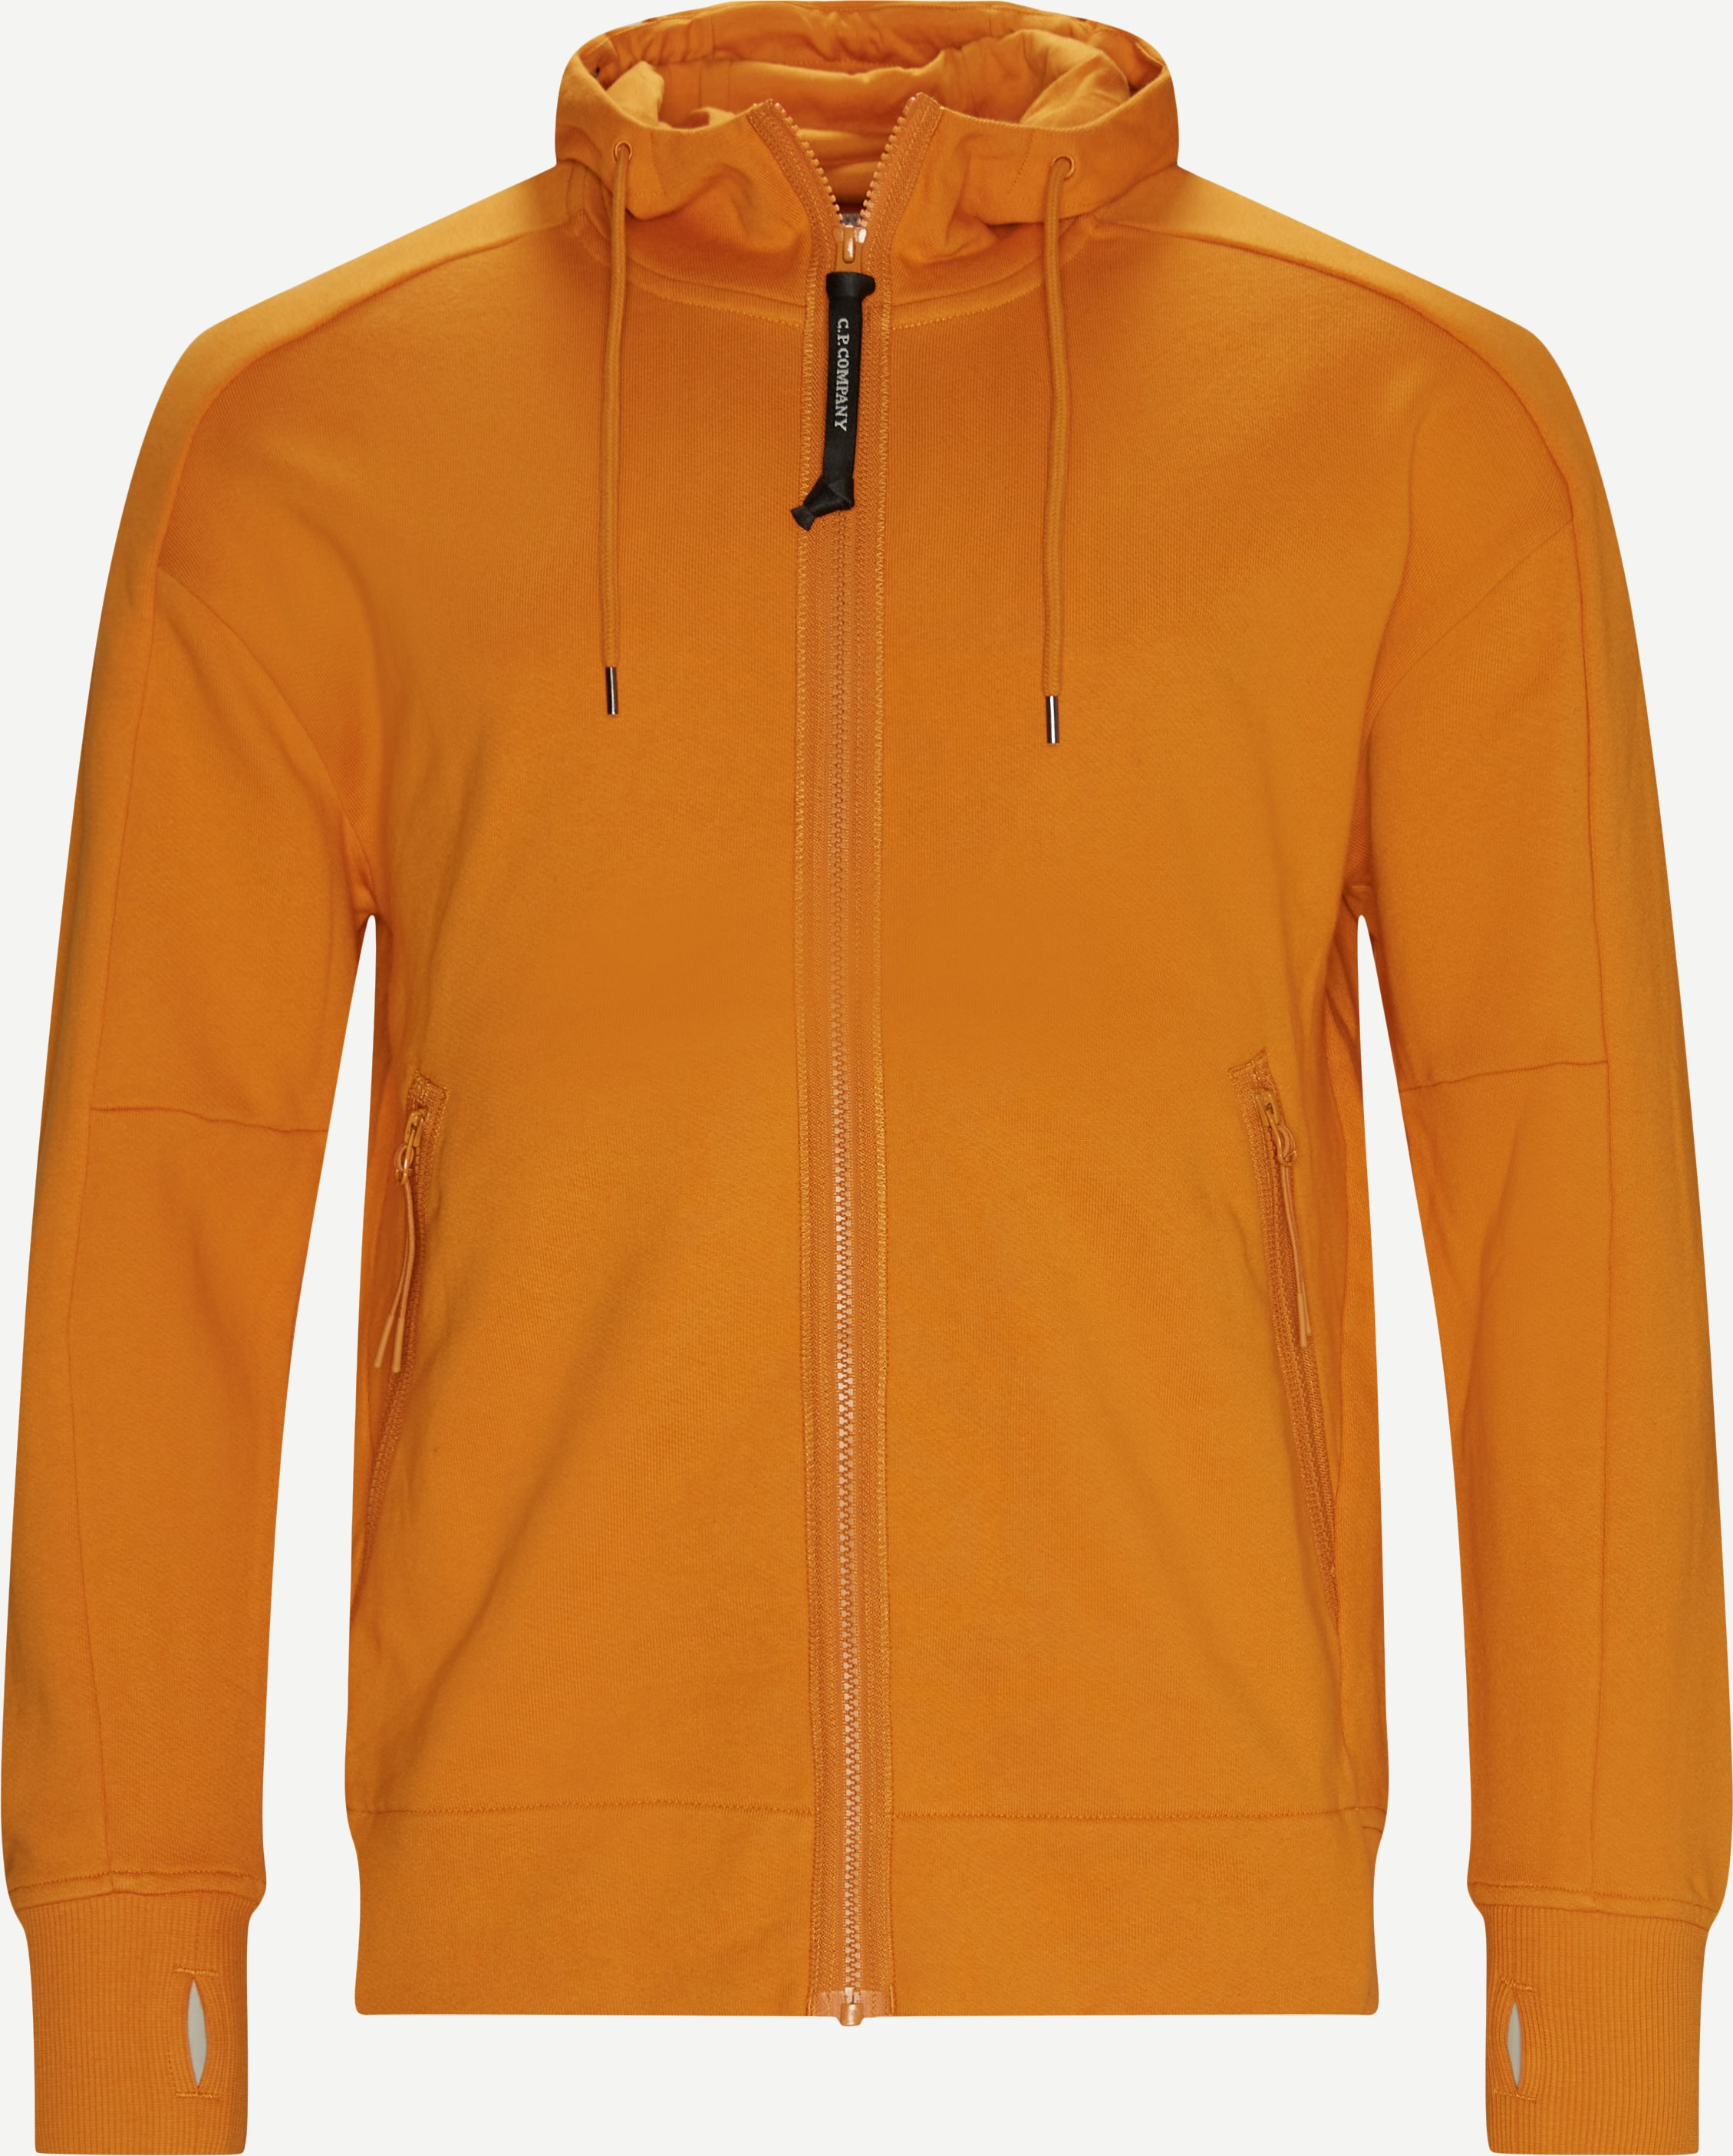 Sweatshirts - Regular fit - Orange